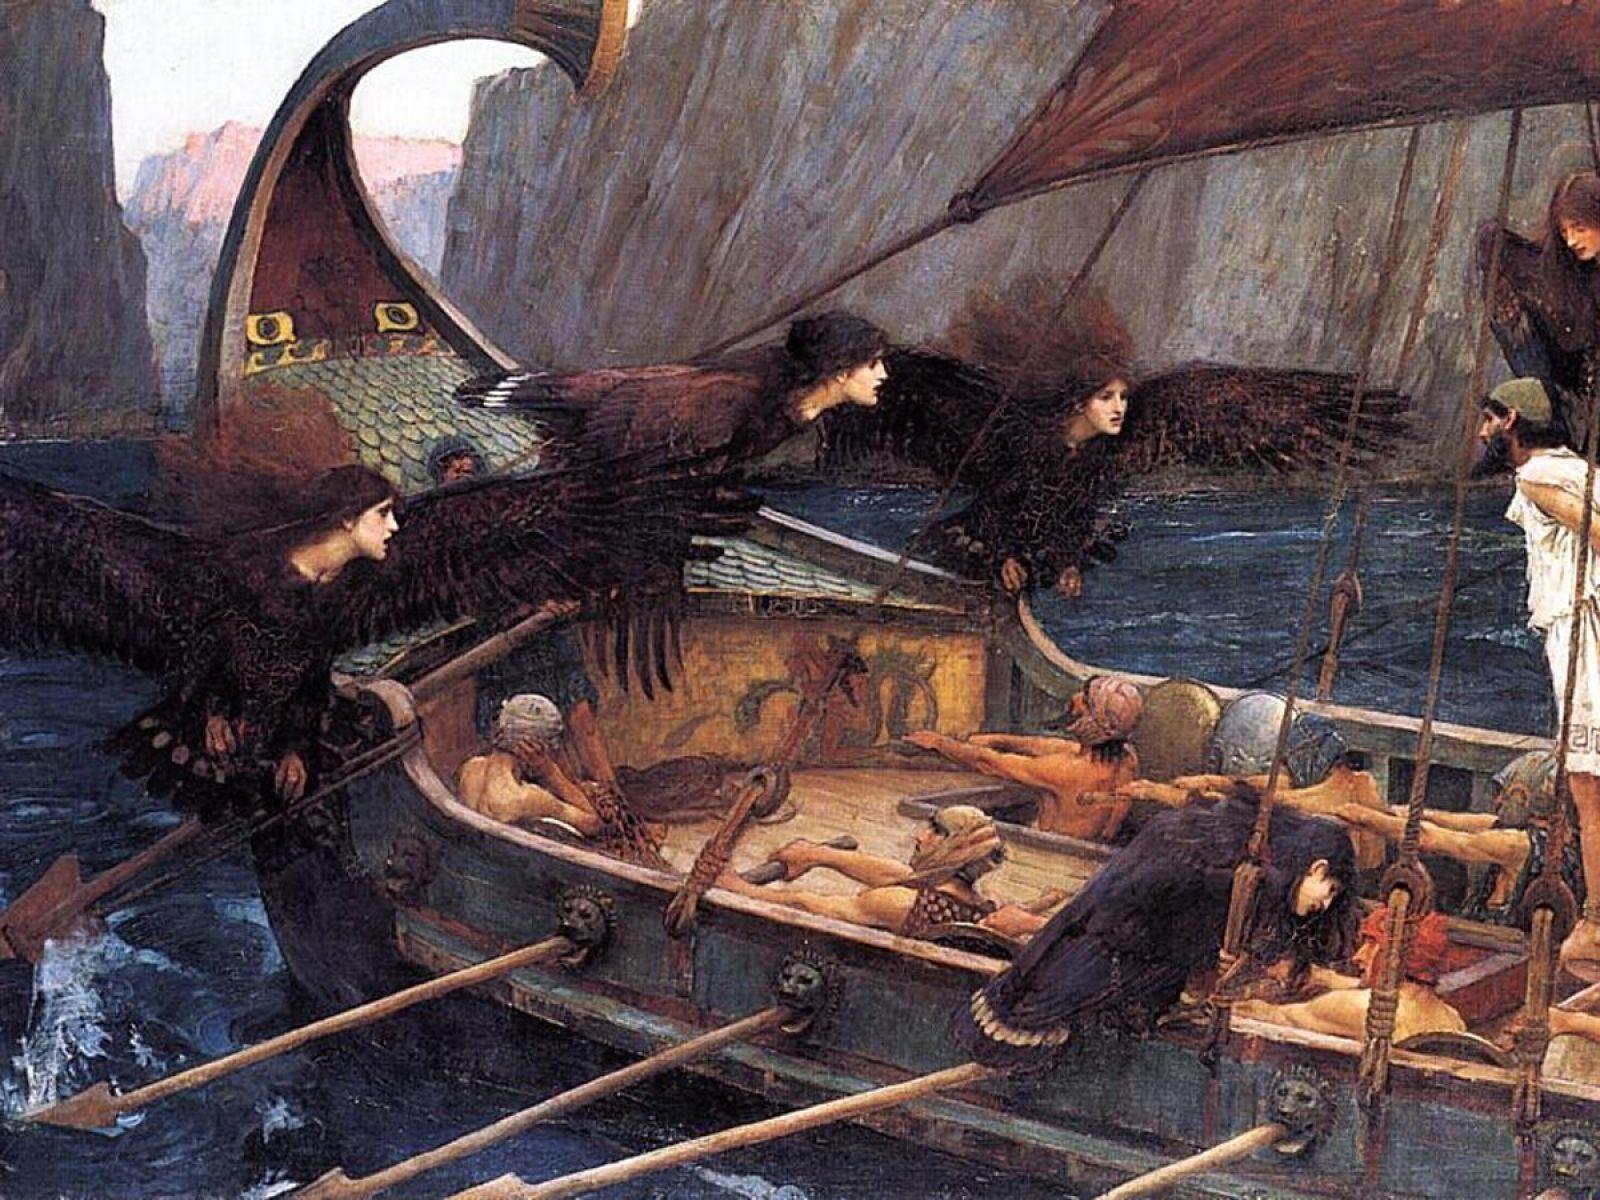 Painting Ship Siren Artwork John William Waterhouse Greek Mythology Odysseu 1820x900 Wallpape Art Hd Wa Sirene Creature Mitologiche Summary Of Daffodil 9th Class